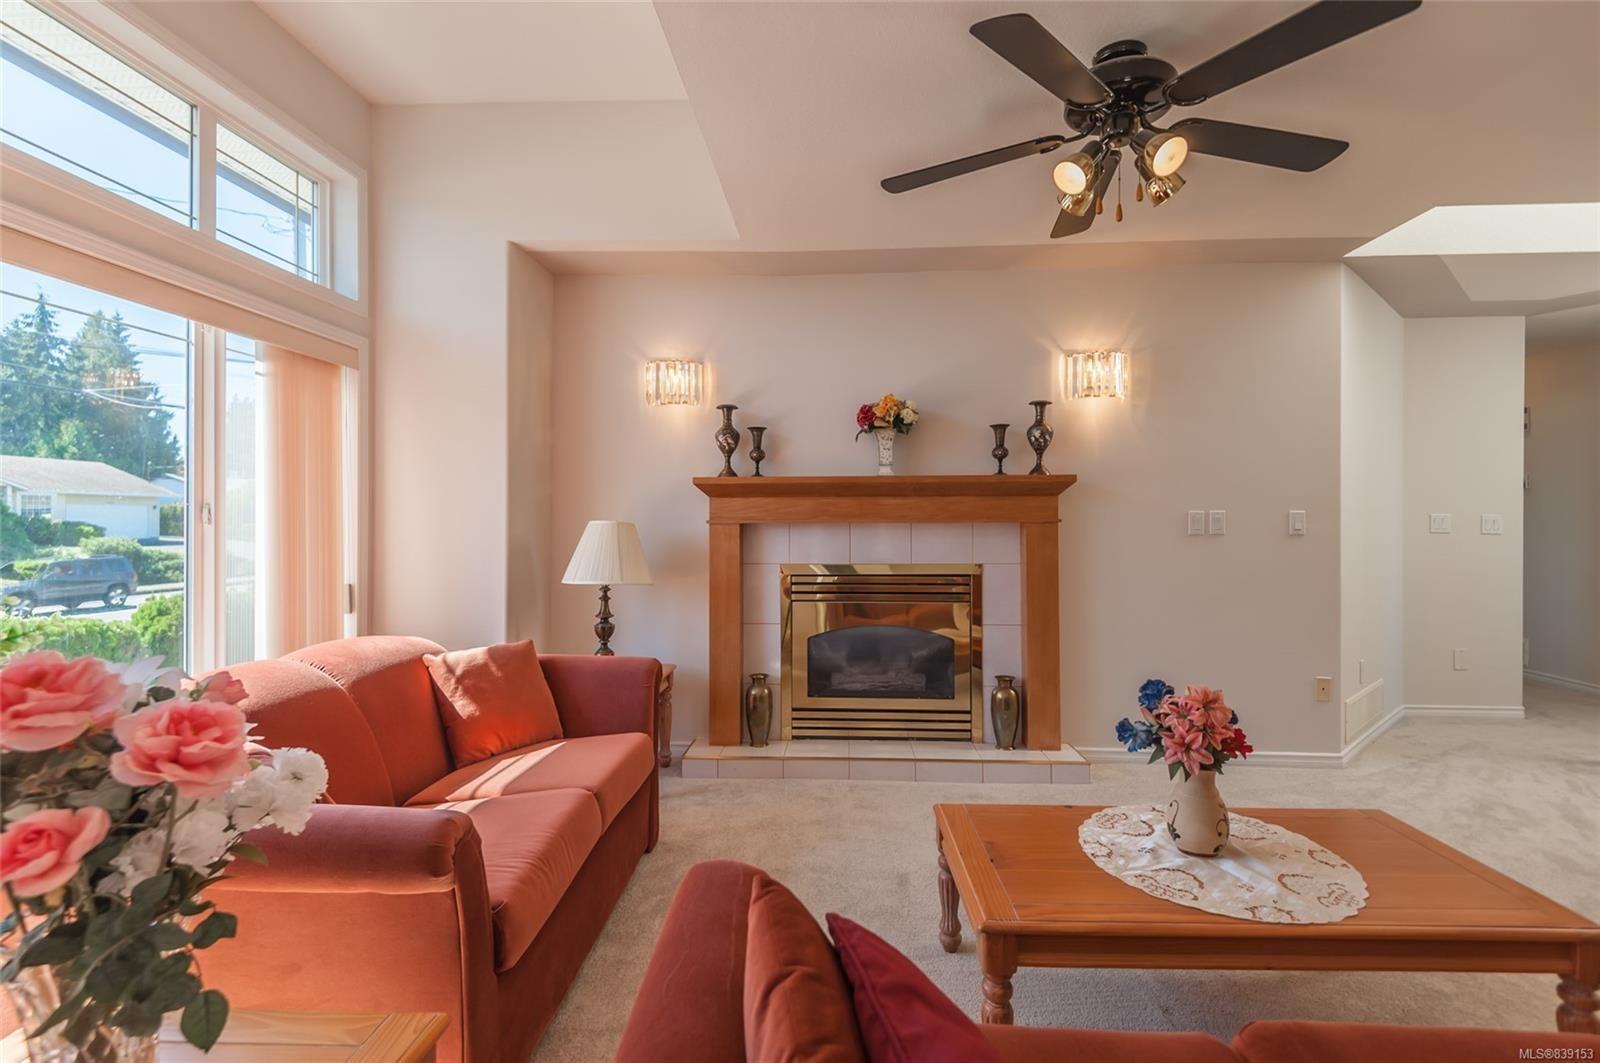 Photo 11: Photos: 6412 Dover Rd in NANAIMO: Na North Nanaimo House for sale (Nanaimo)  : MLS®# 839153